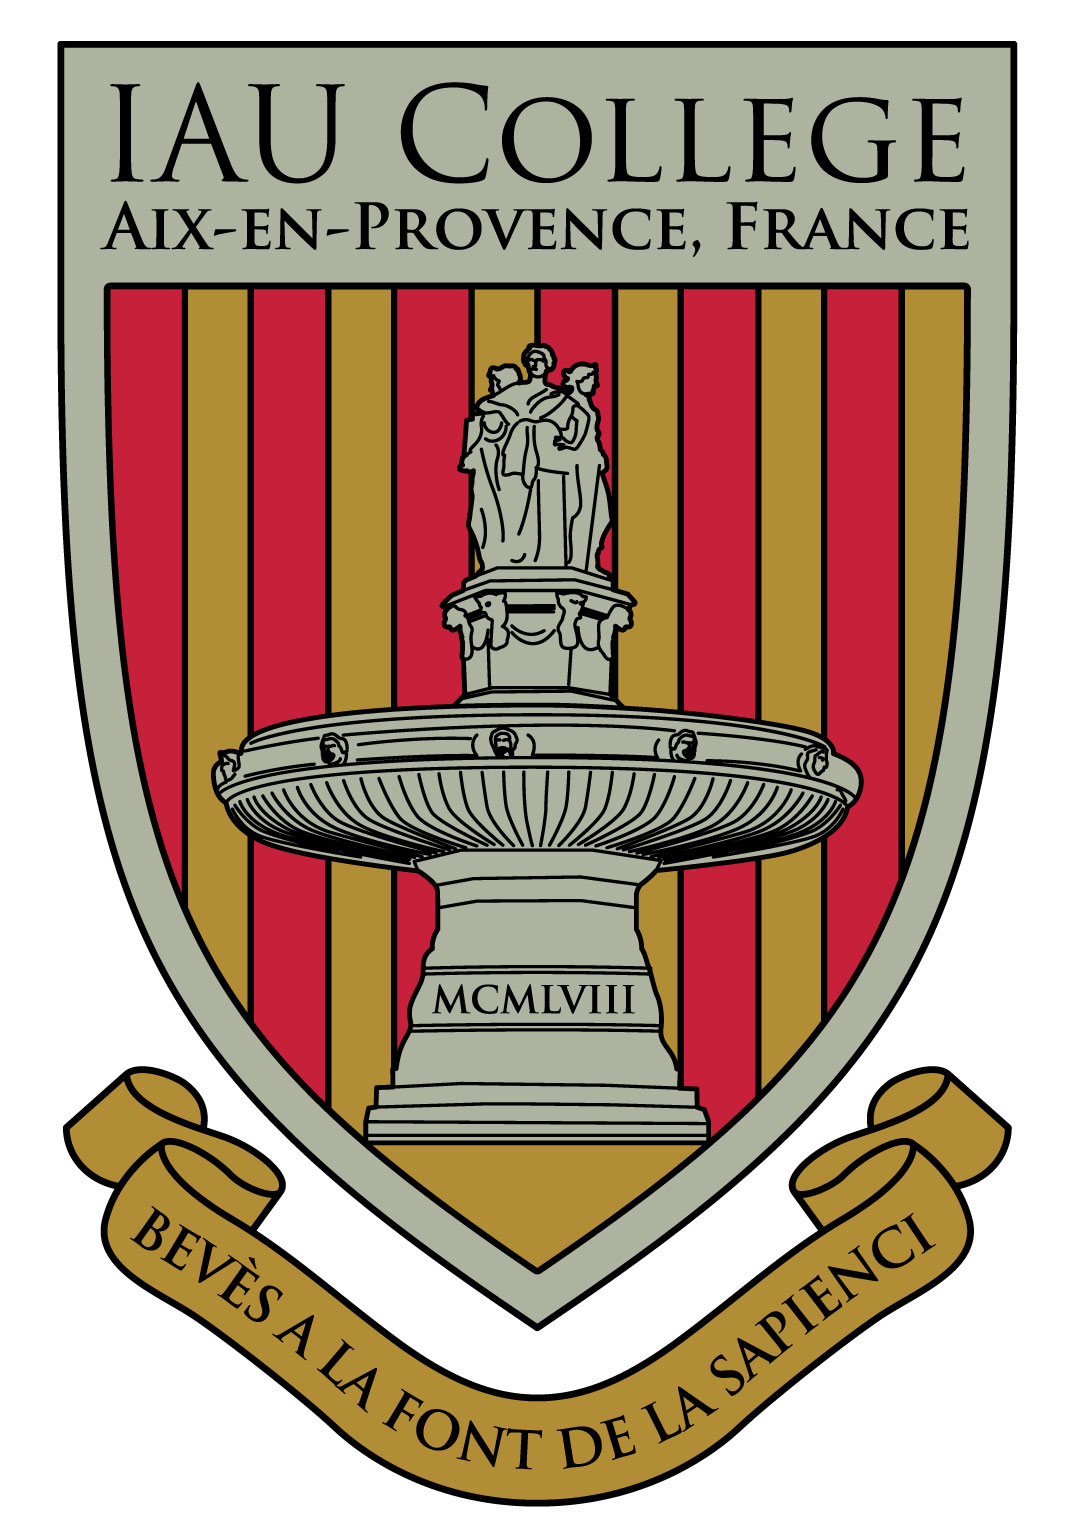 institute for american iau college